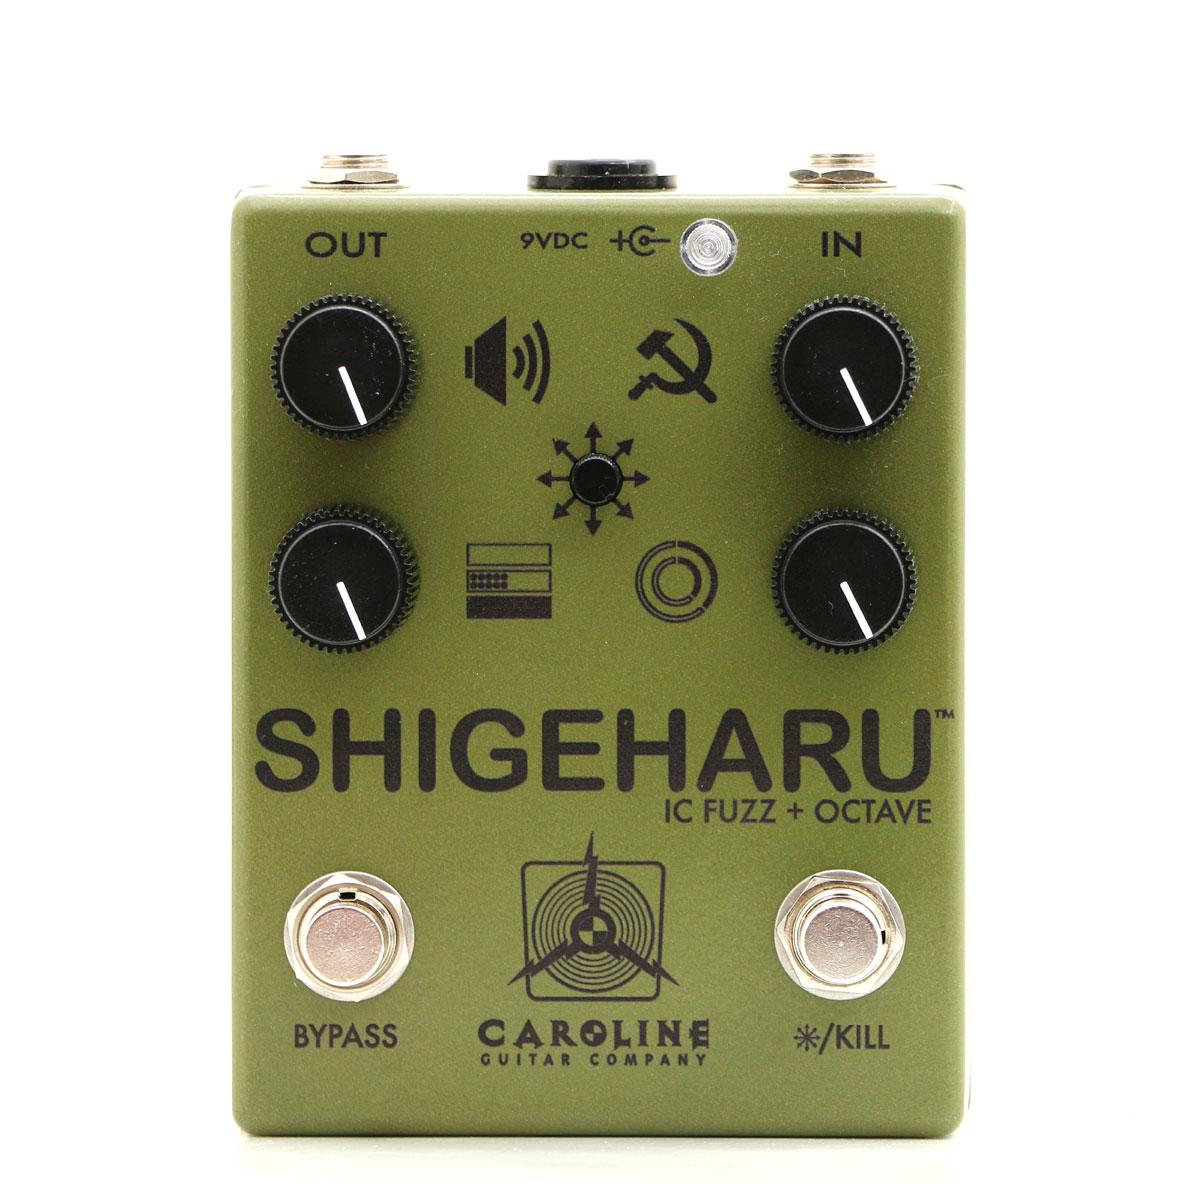 Caroline Guitar Company,Shigeharu,コロンビア,ファズ,限定,ビッグマフ系